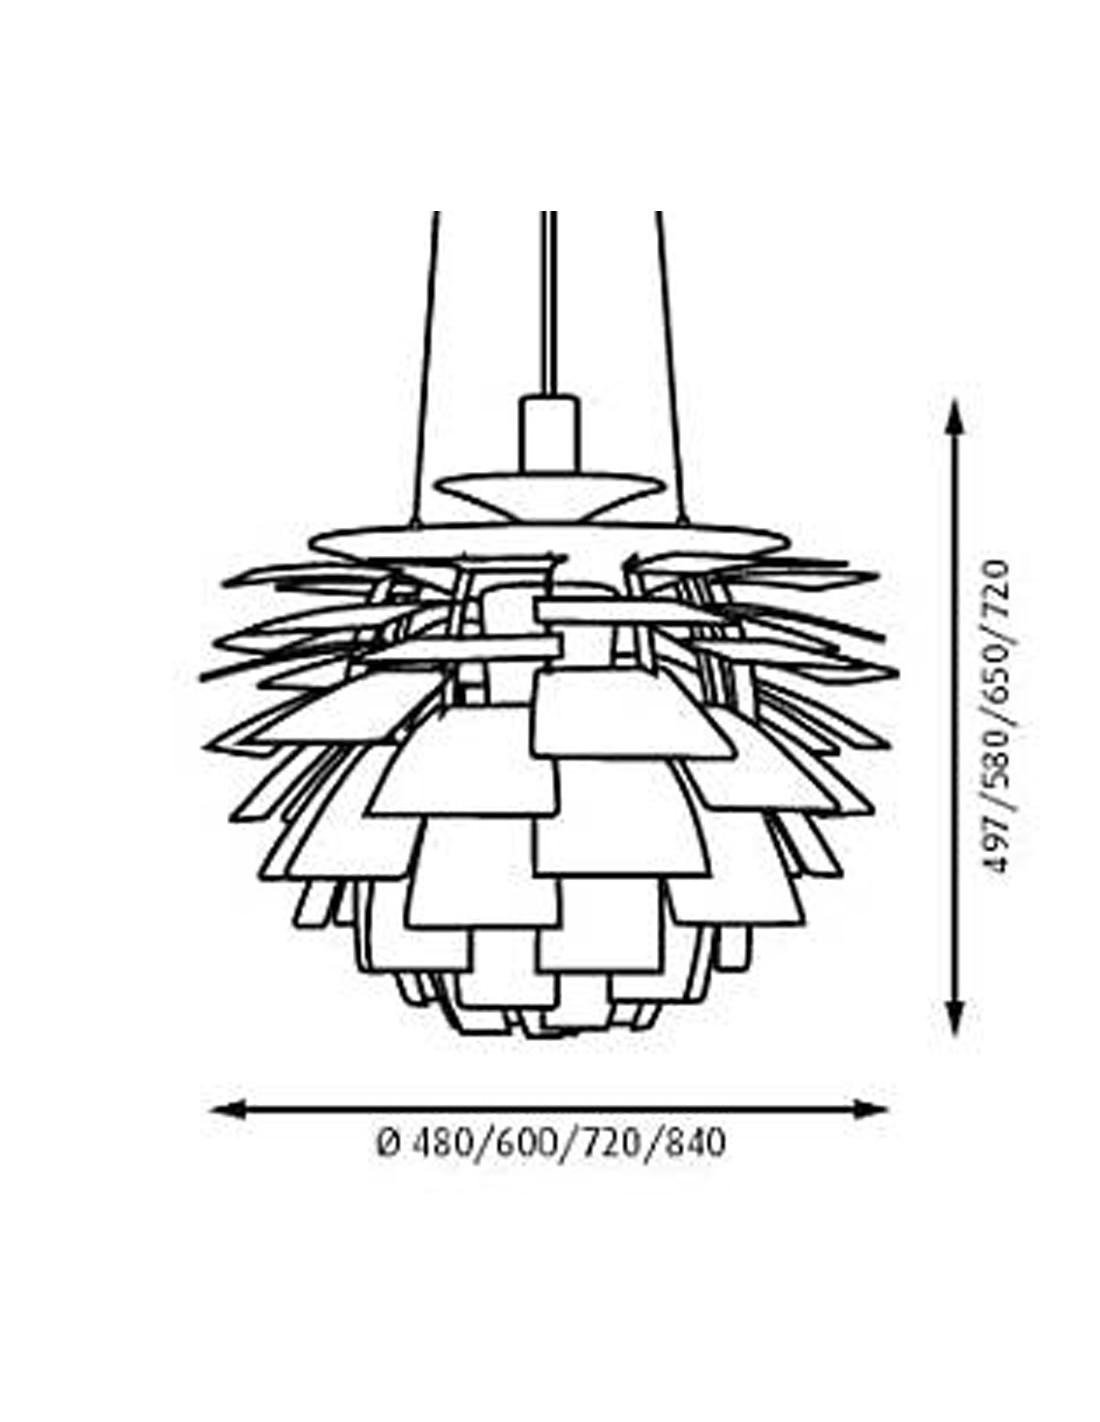 Ph artichoke pendant poul henningsen design for louis poulsen la ph artichoke louis poulsen mozeypictures Images